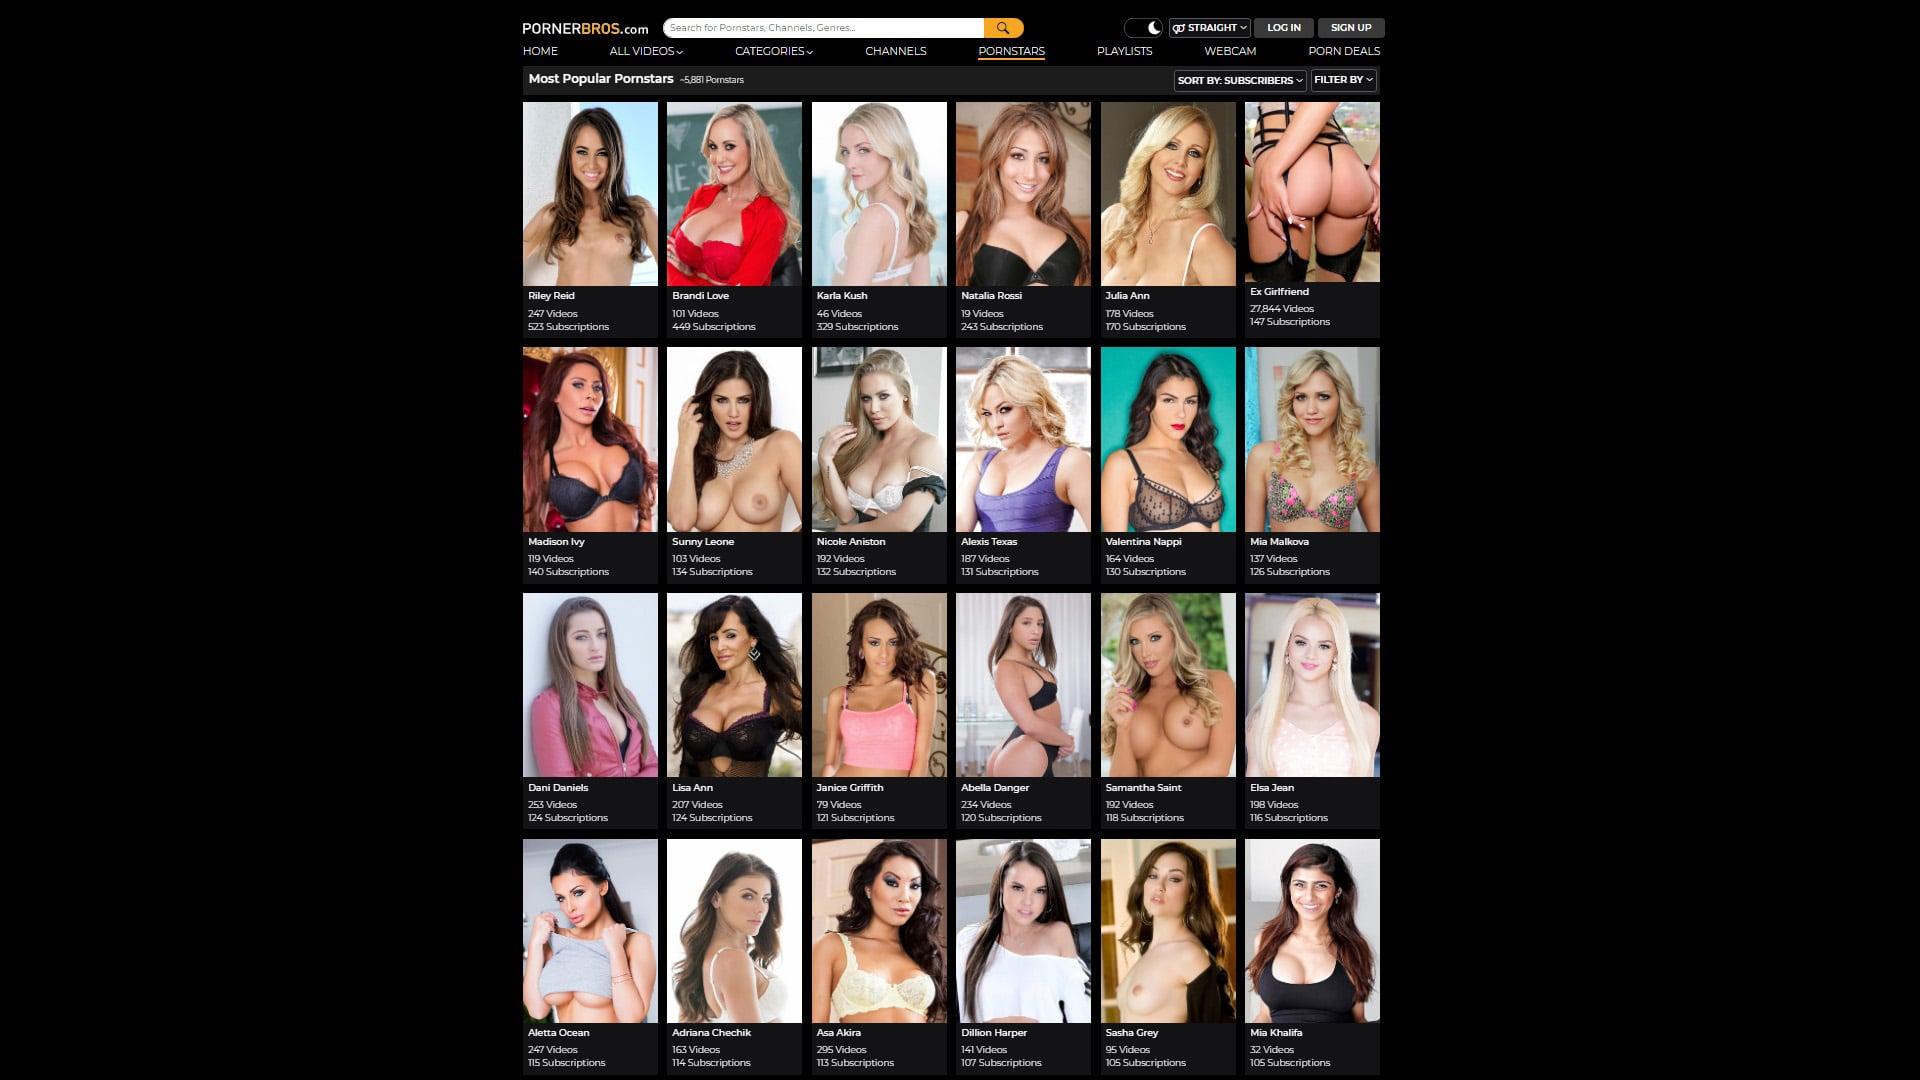 Porner Bros Pornstars